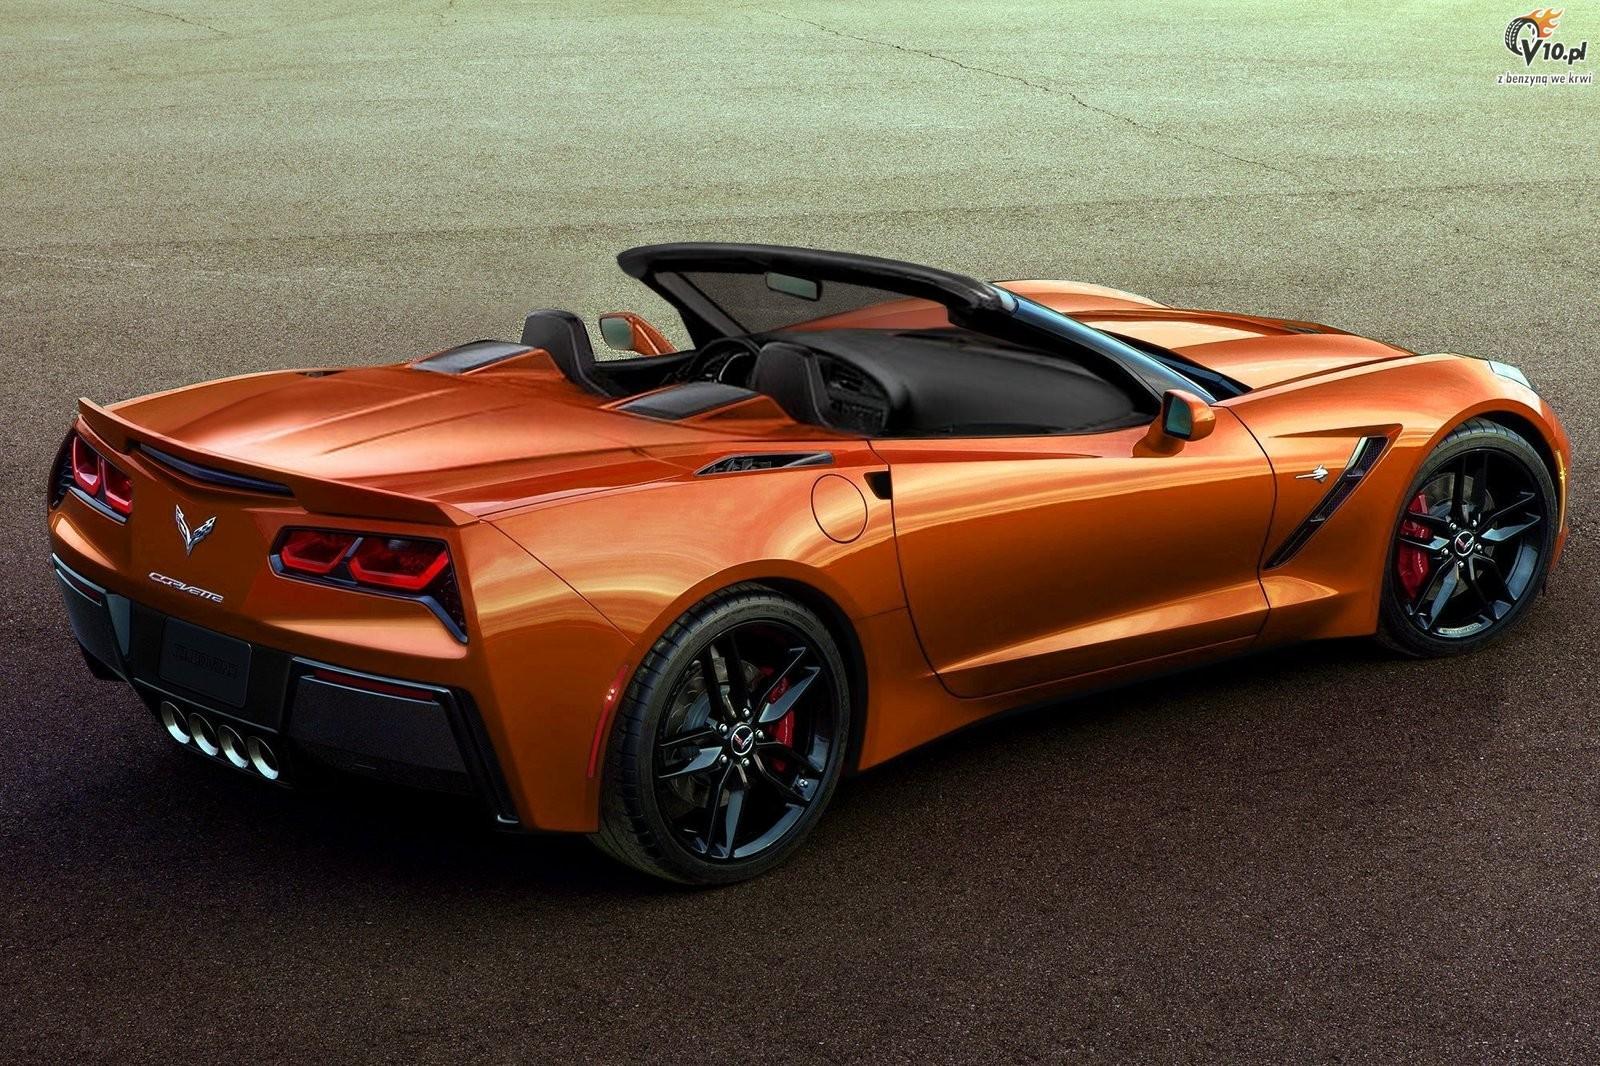 2014 chevrolet corvette c7 autos weblog. Black Bedroom Furniture Sets. Home Design Ideas